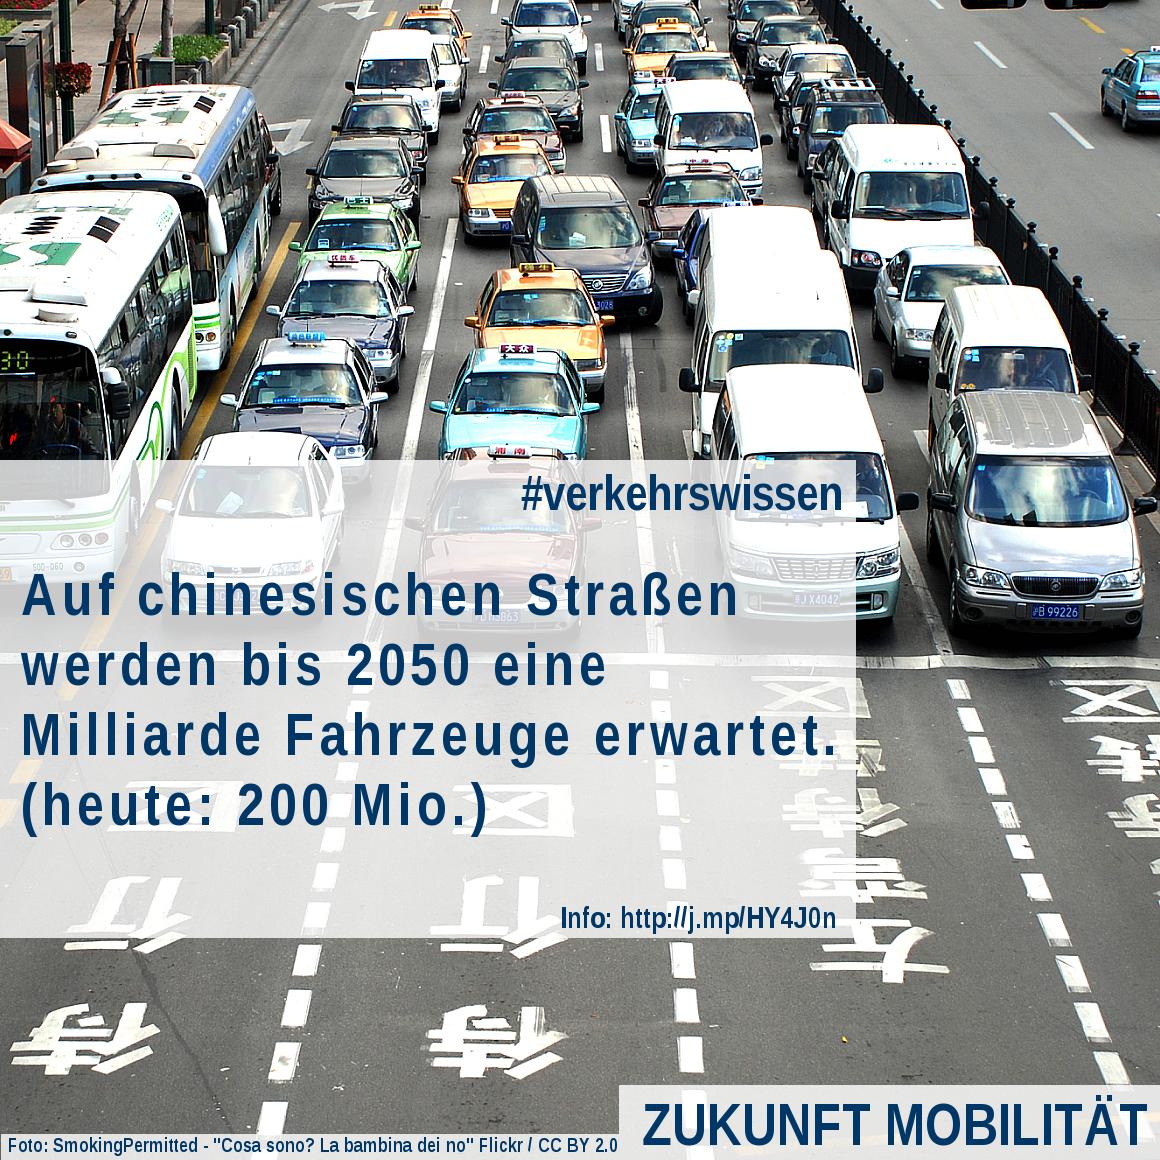 http://www.zukunft-mobilitaet.net/wp-content/uploads/2013/11/prognose-fahrzeuge-china-2050-pkw-aufkommen.png